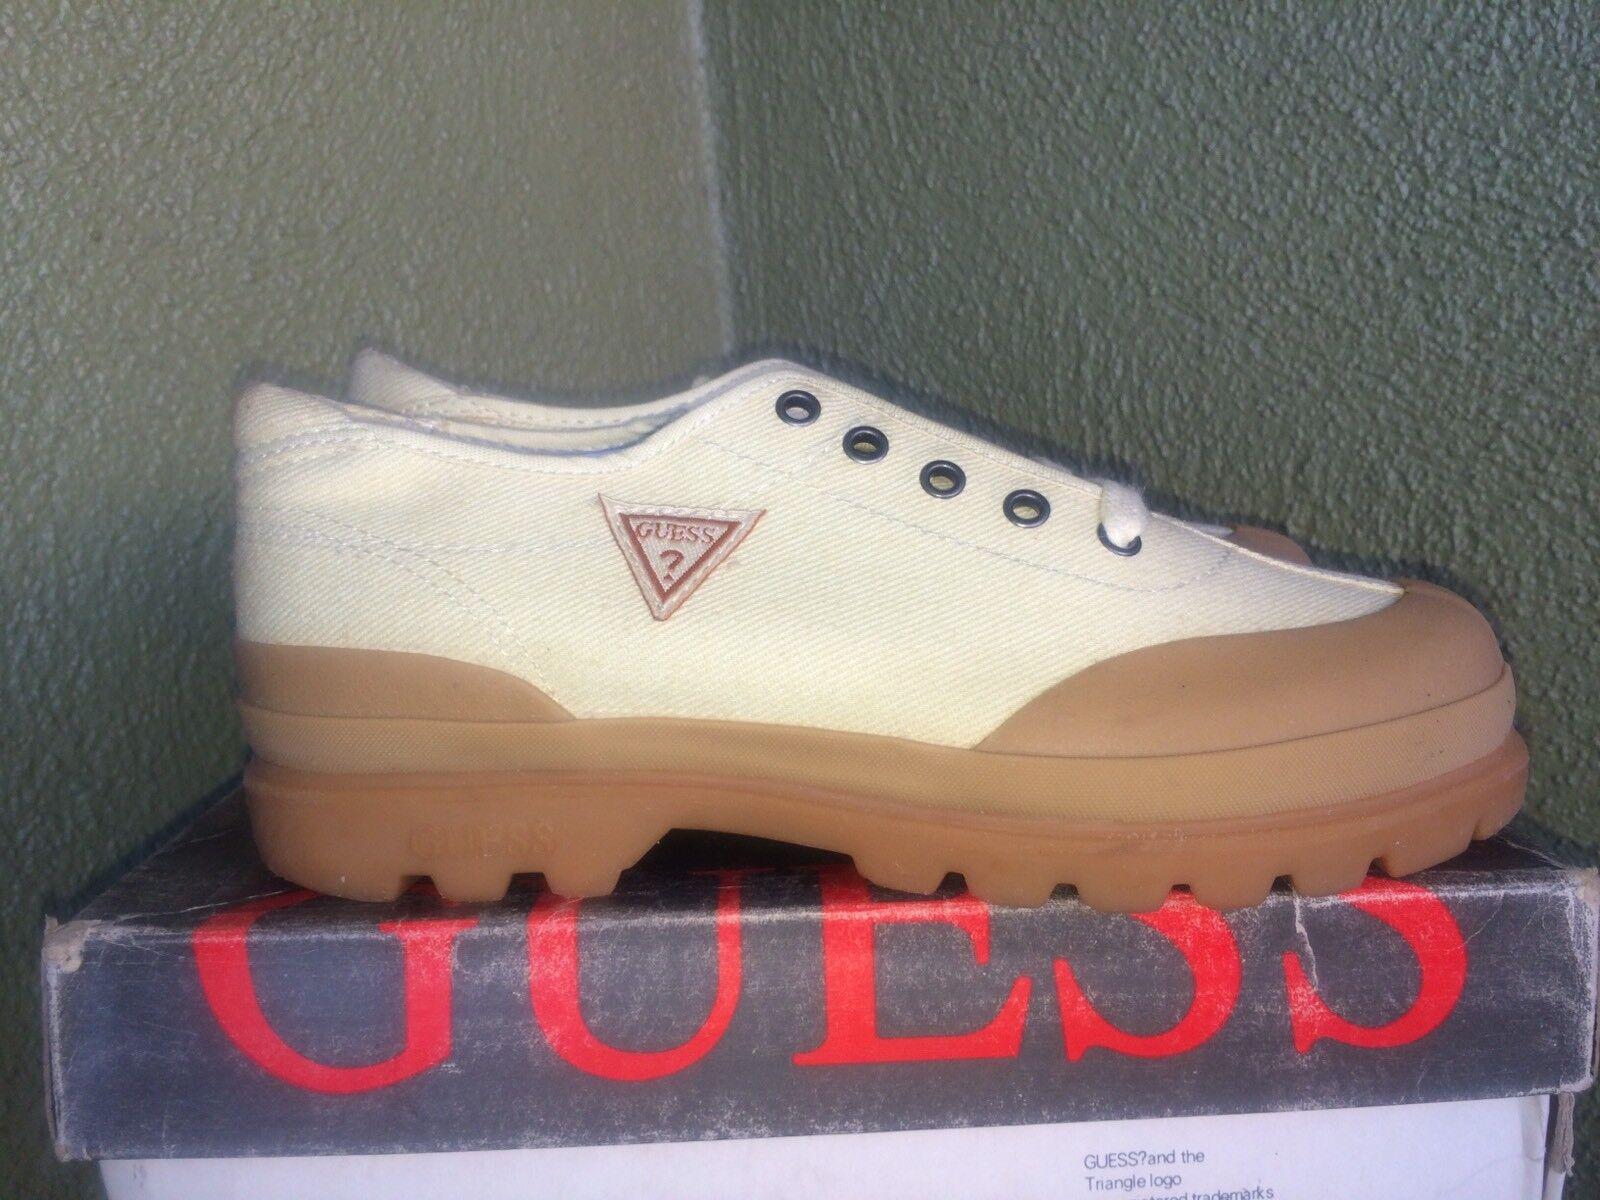 VINTAGE 1990's GUESS Flatrock Junior Low Size 5.5US Women Georges Marciano Jeans